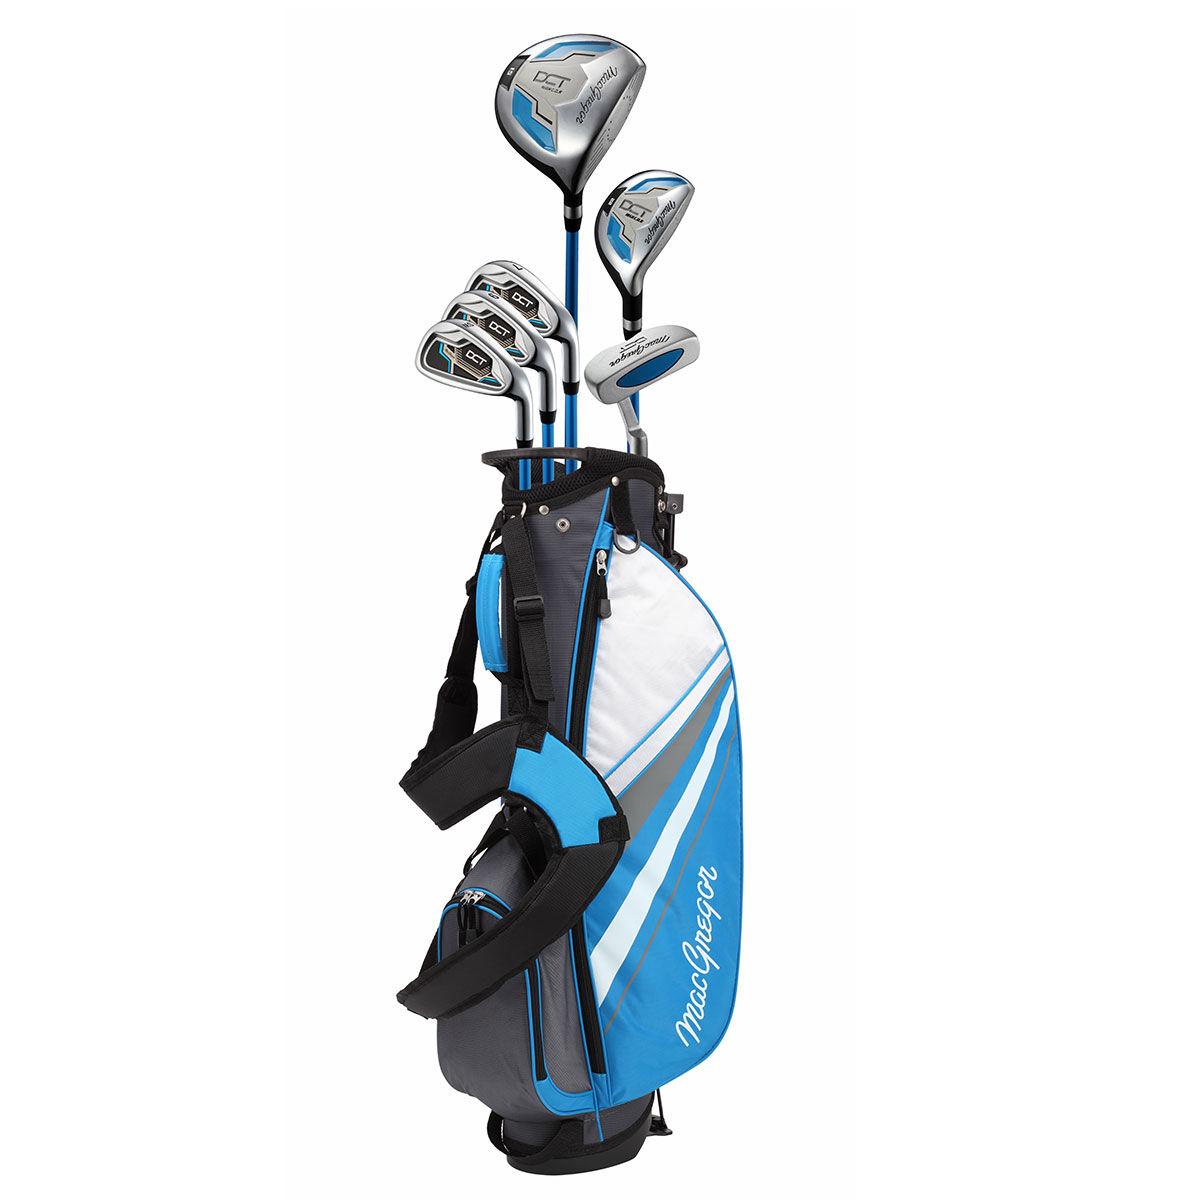 MacGregor DCT 9-12 Junior Golf Package Set, Unisex, Right hand, Blue   American Golf